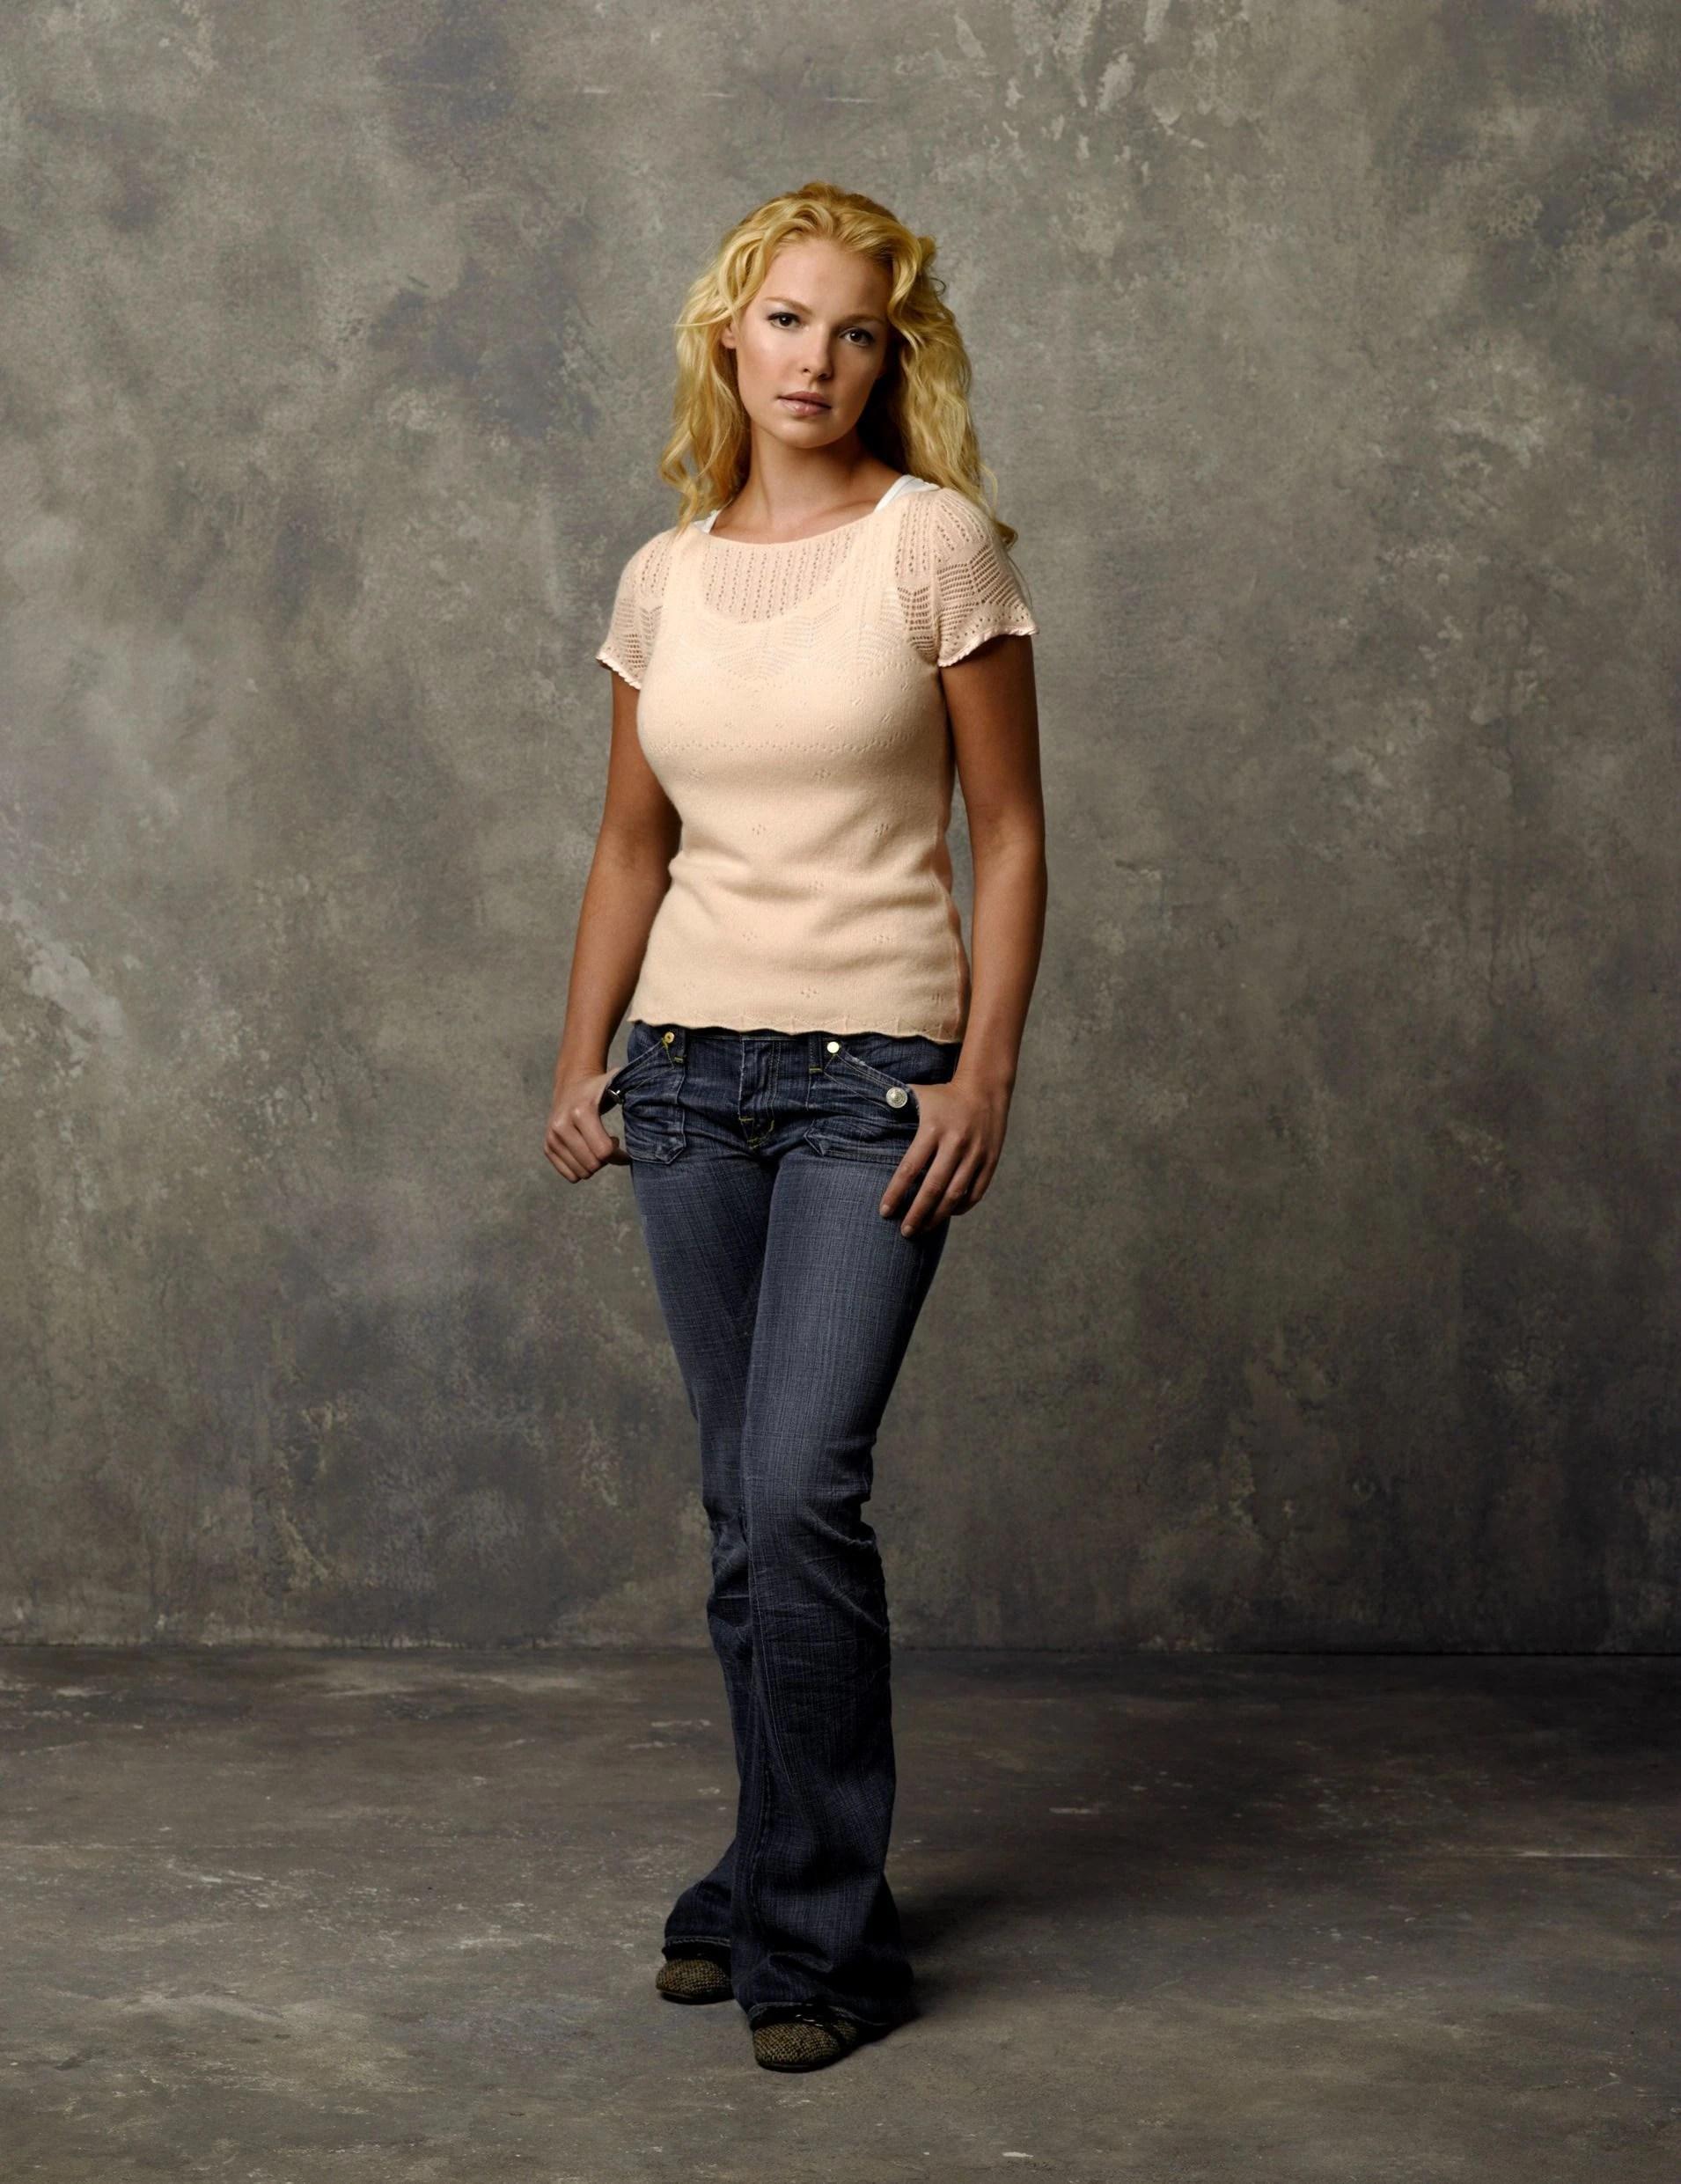 Image - Izzy-promo-3-9.jpg | Grey's Anatomy Universe Wiki ...